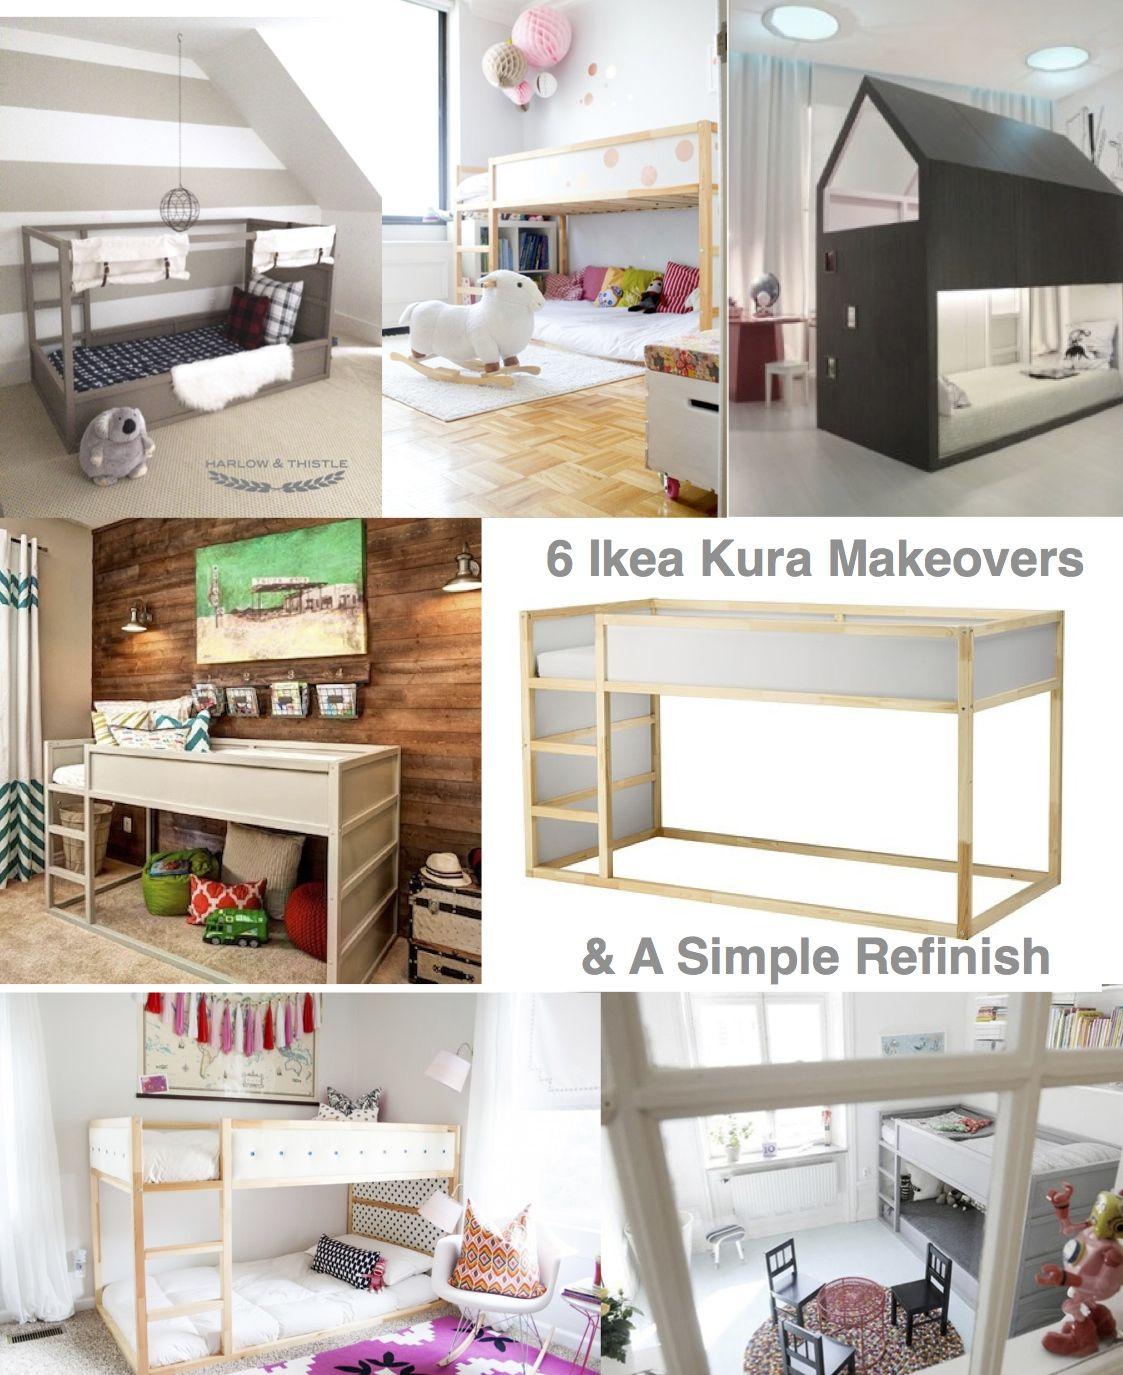 6 Simple To Insane Ikea Kura Makeovers